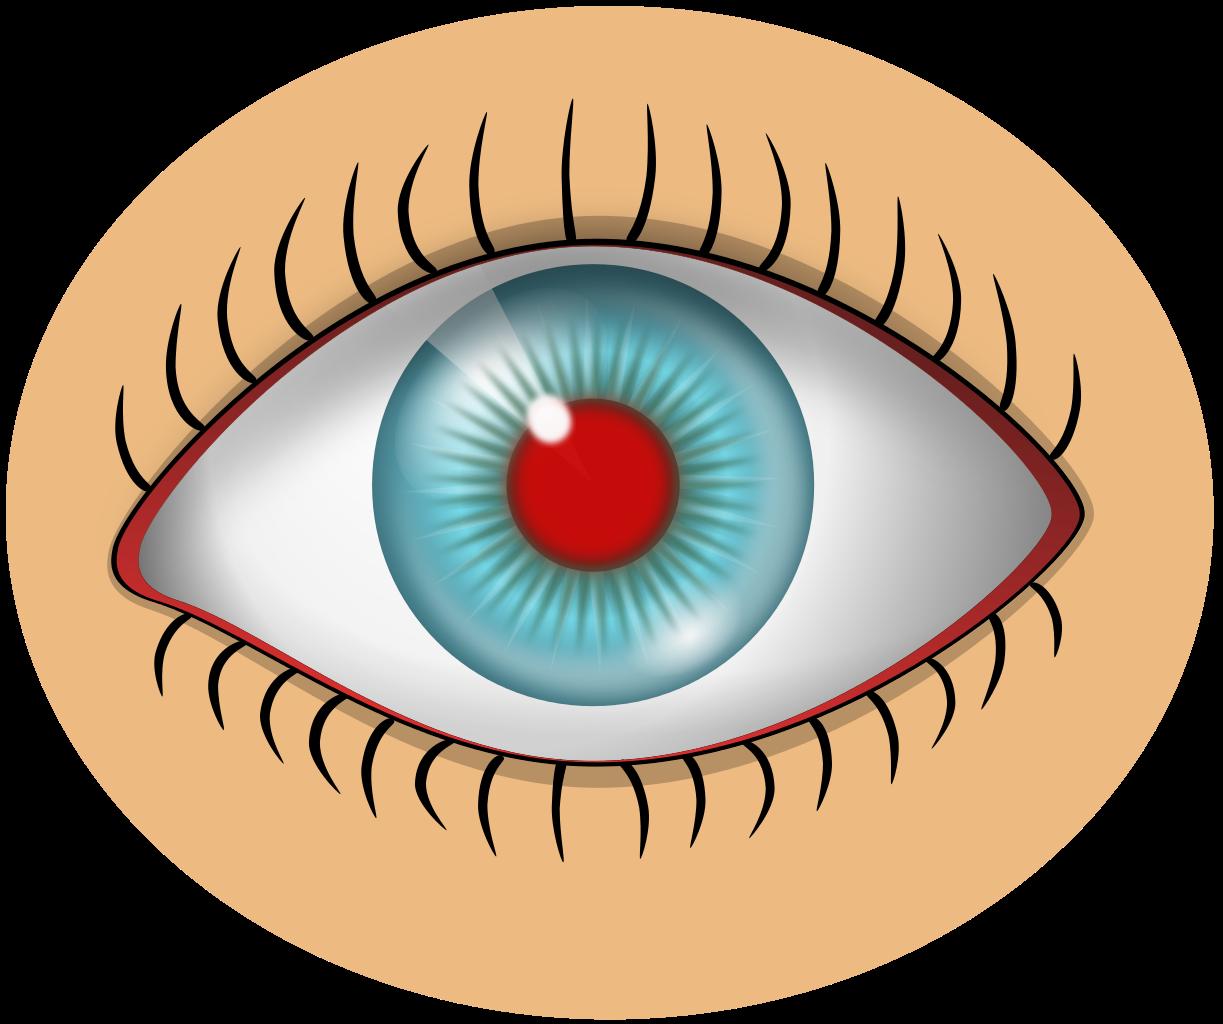 File red svg wikimedia. Eyelash clipart women's eye